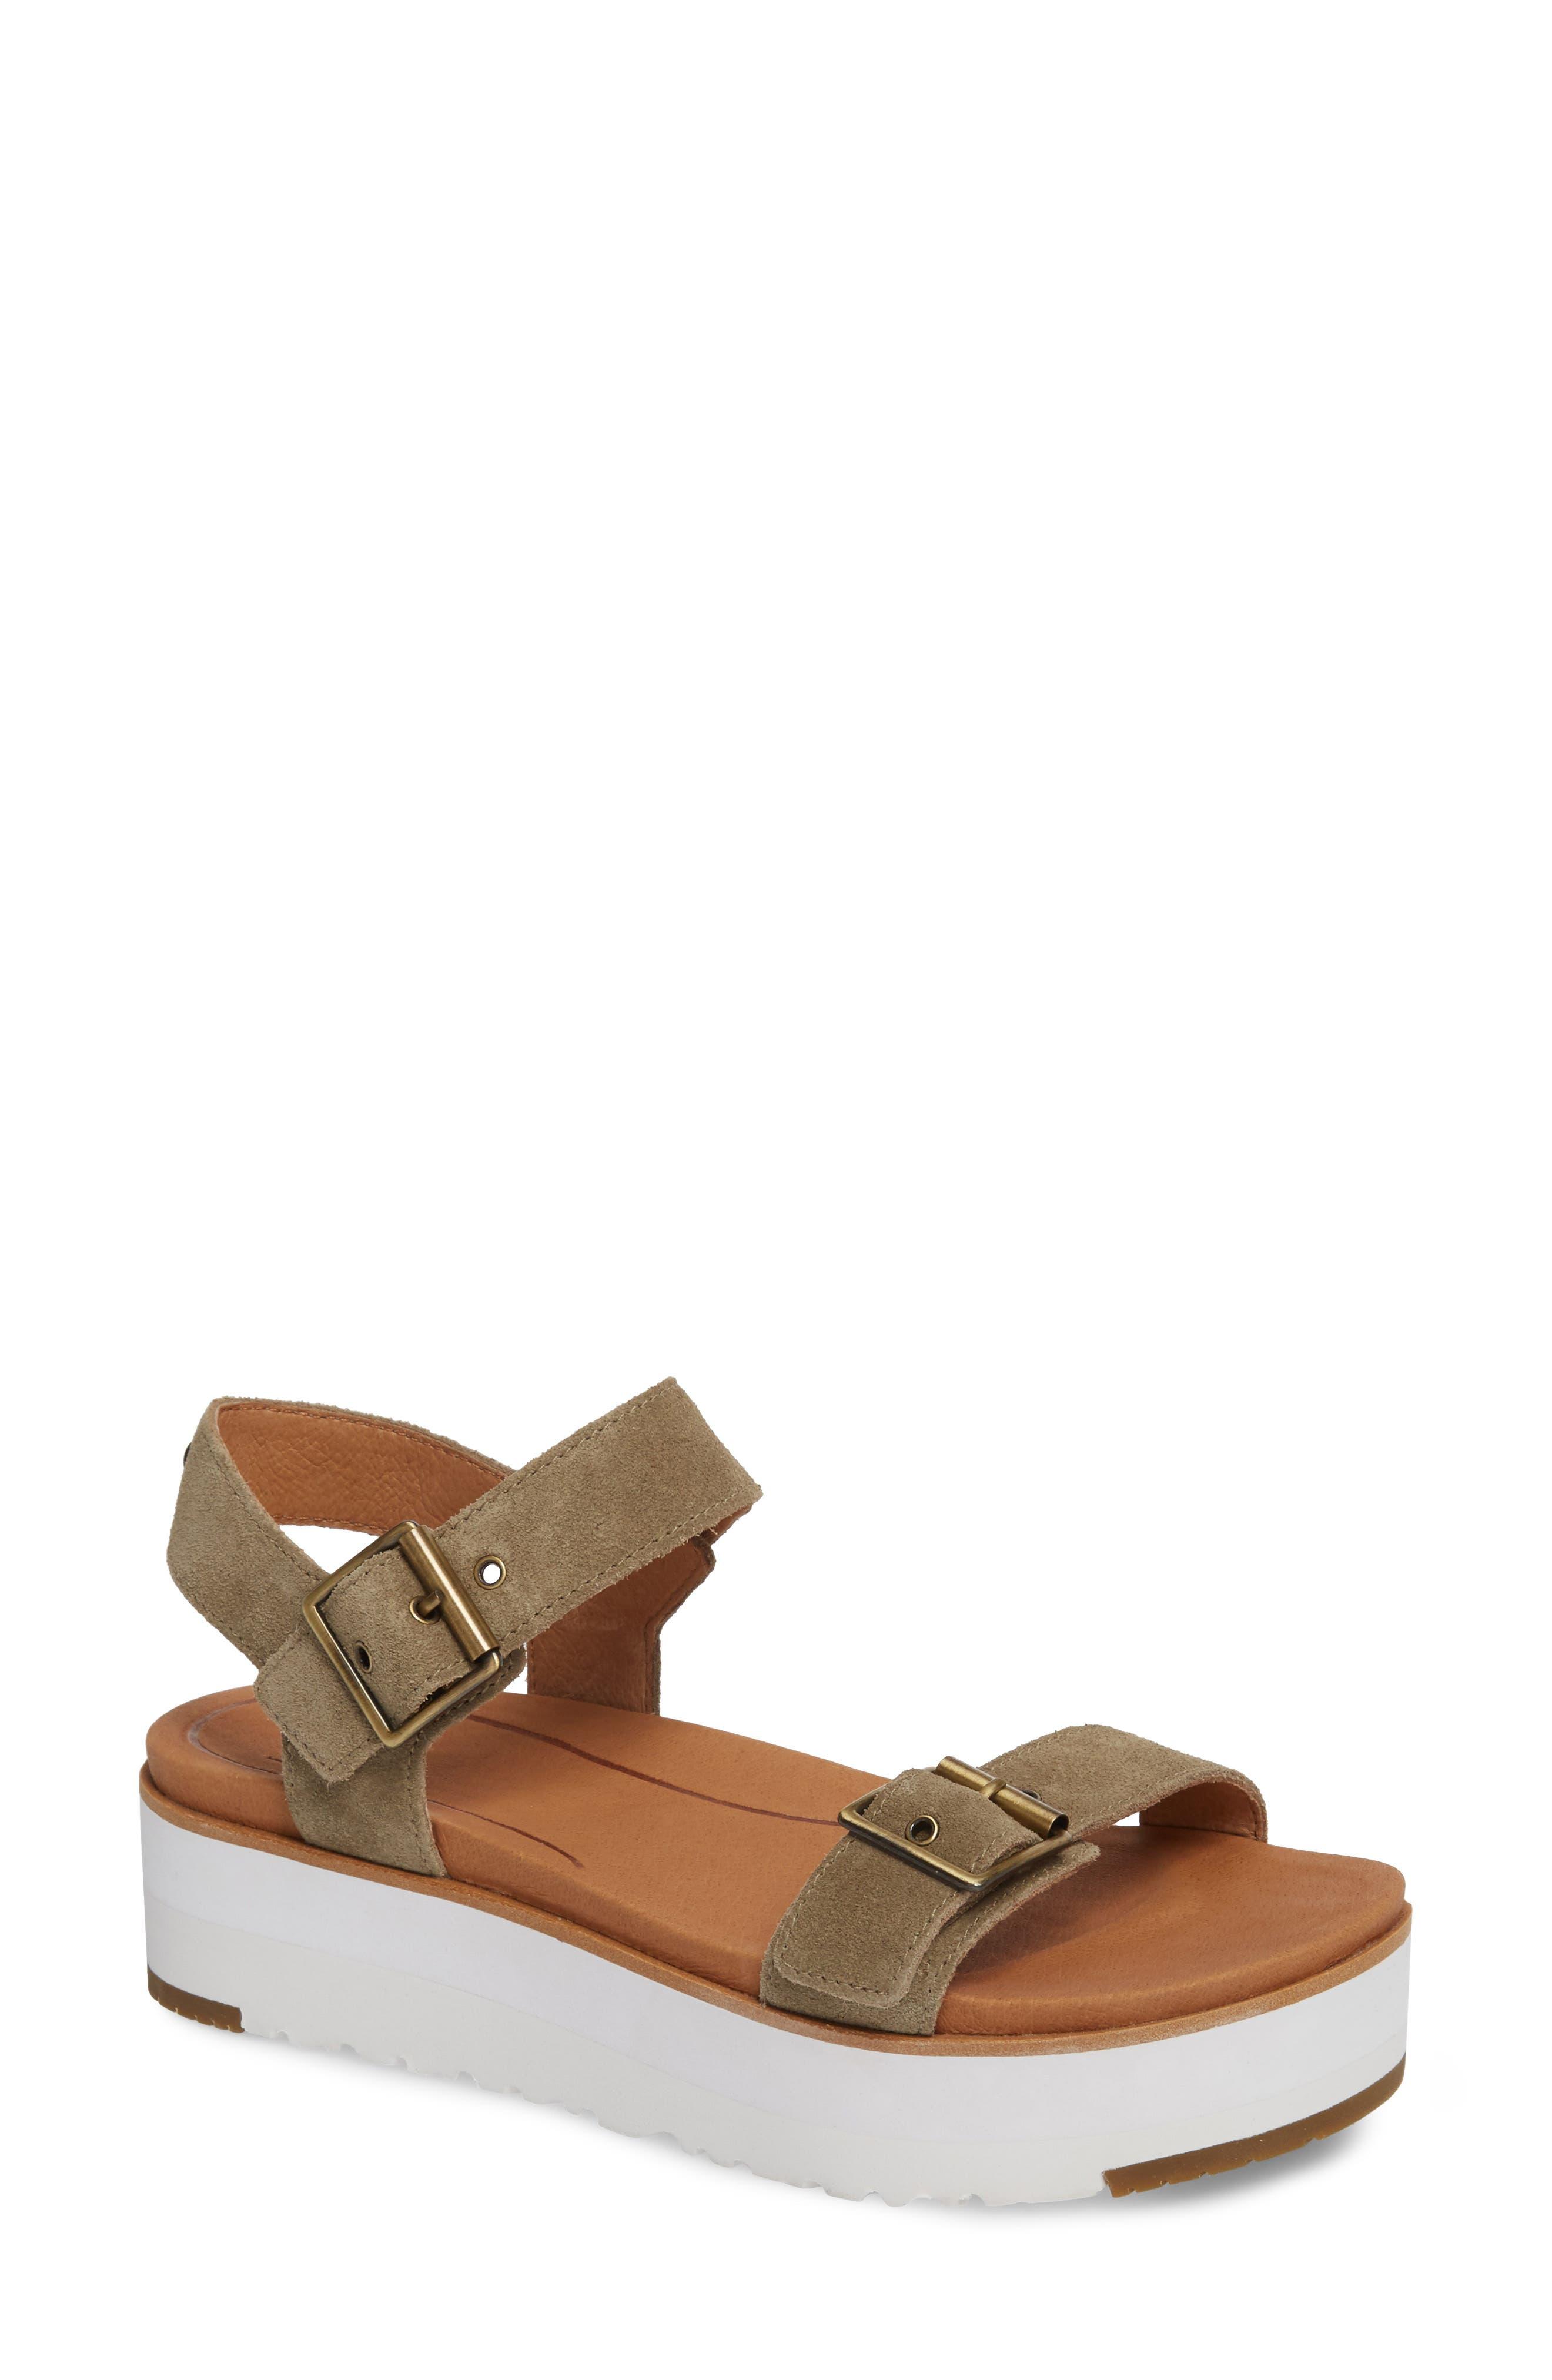 Angie Platform Sandal,                             Main thumbnail 3, color,